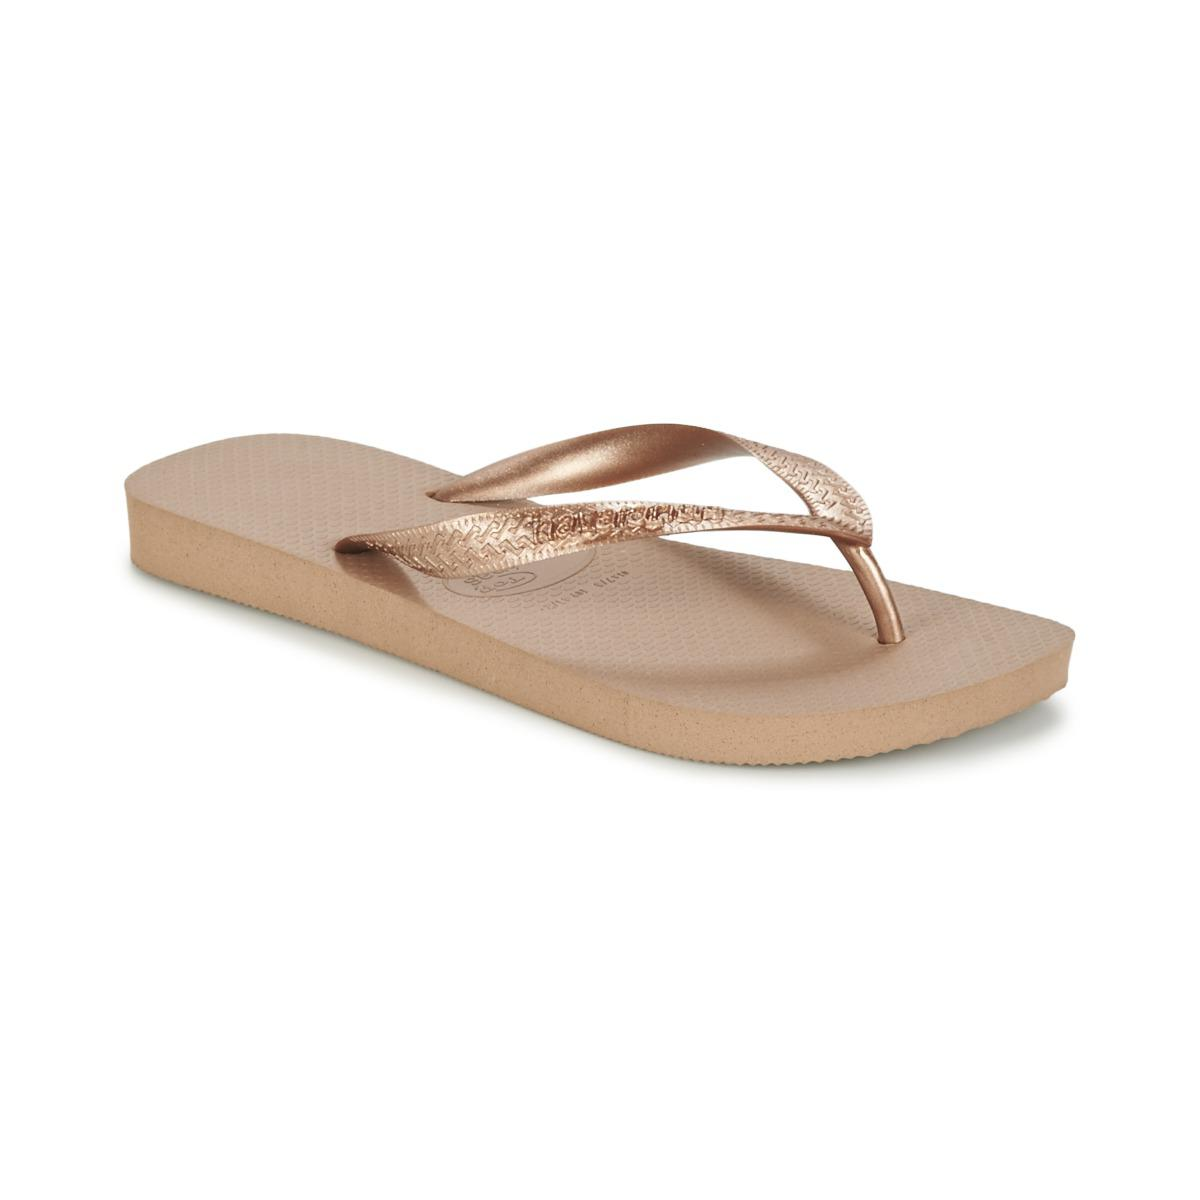 ad9cb6cb921dac Havaianas Top Metallic Women s Flip Flops   Sandals (shoes) In Gold ...